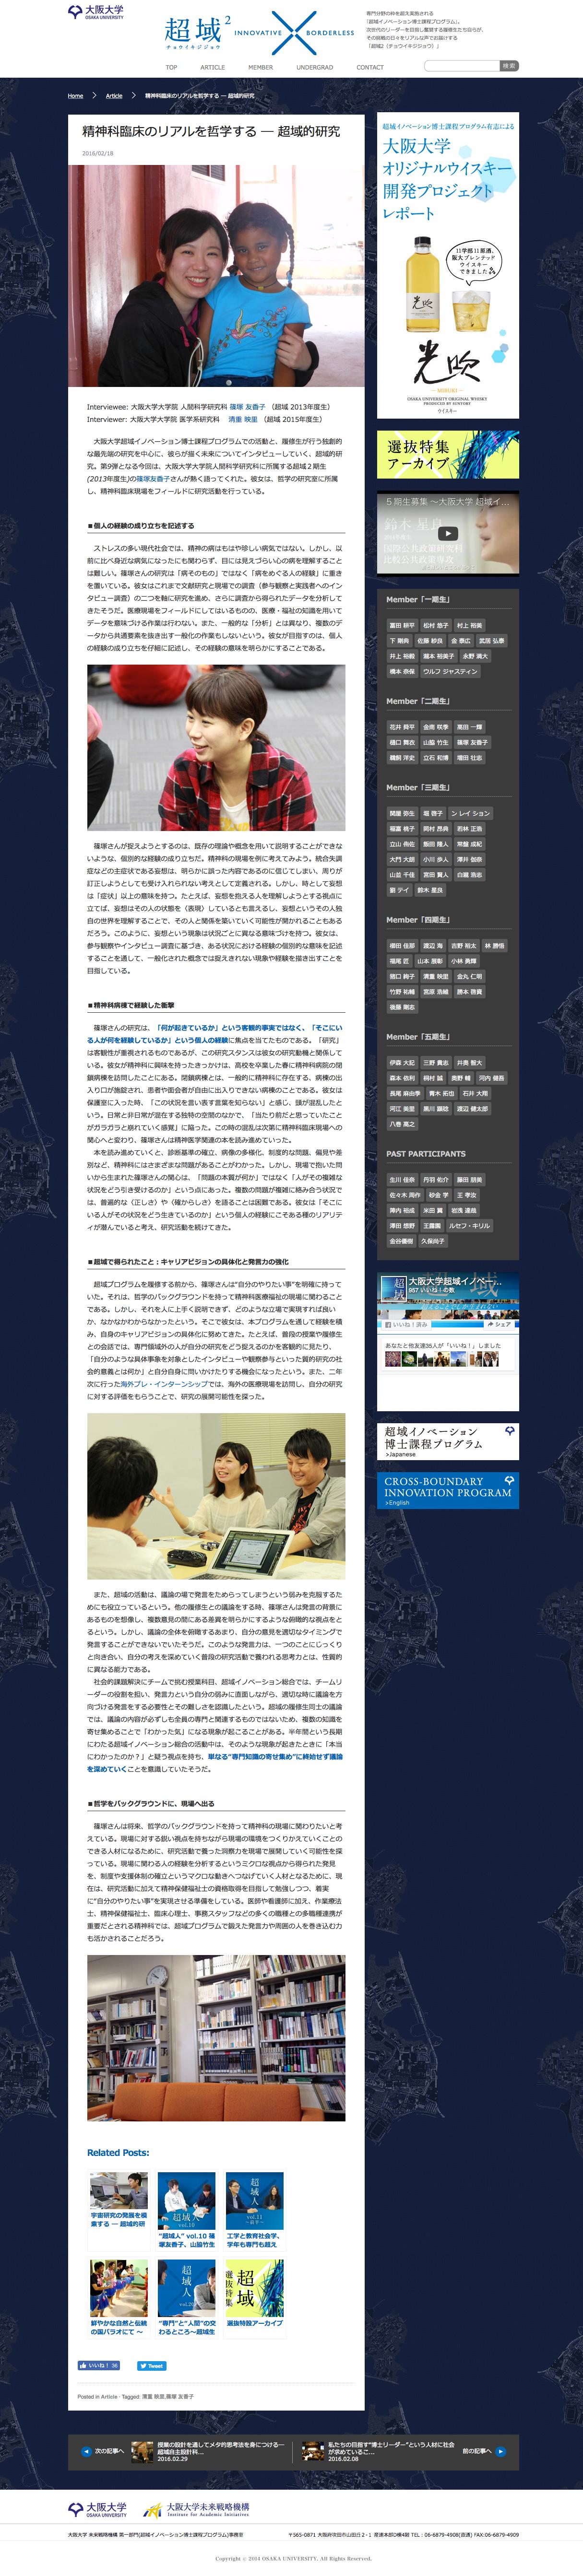 choikijijo_web_report